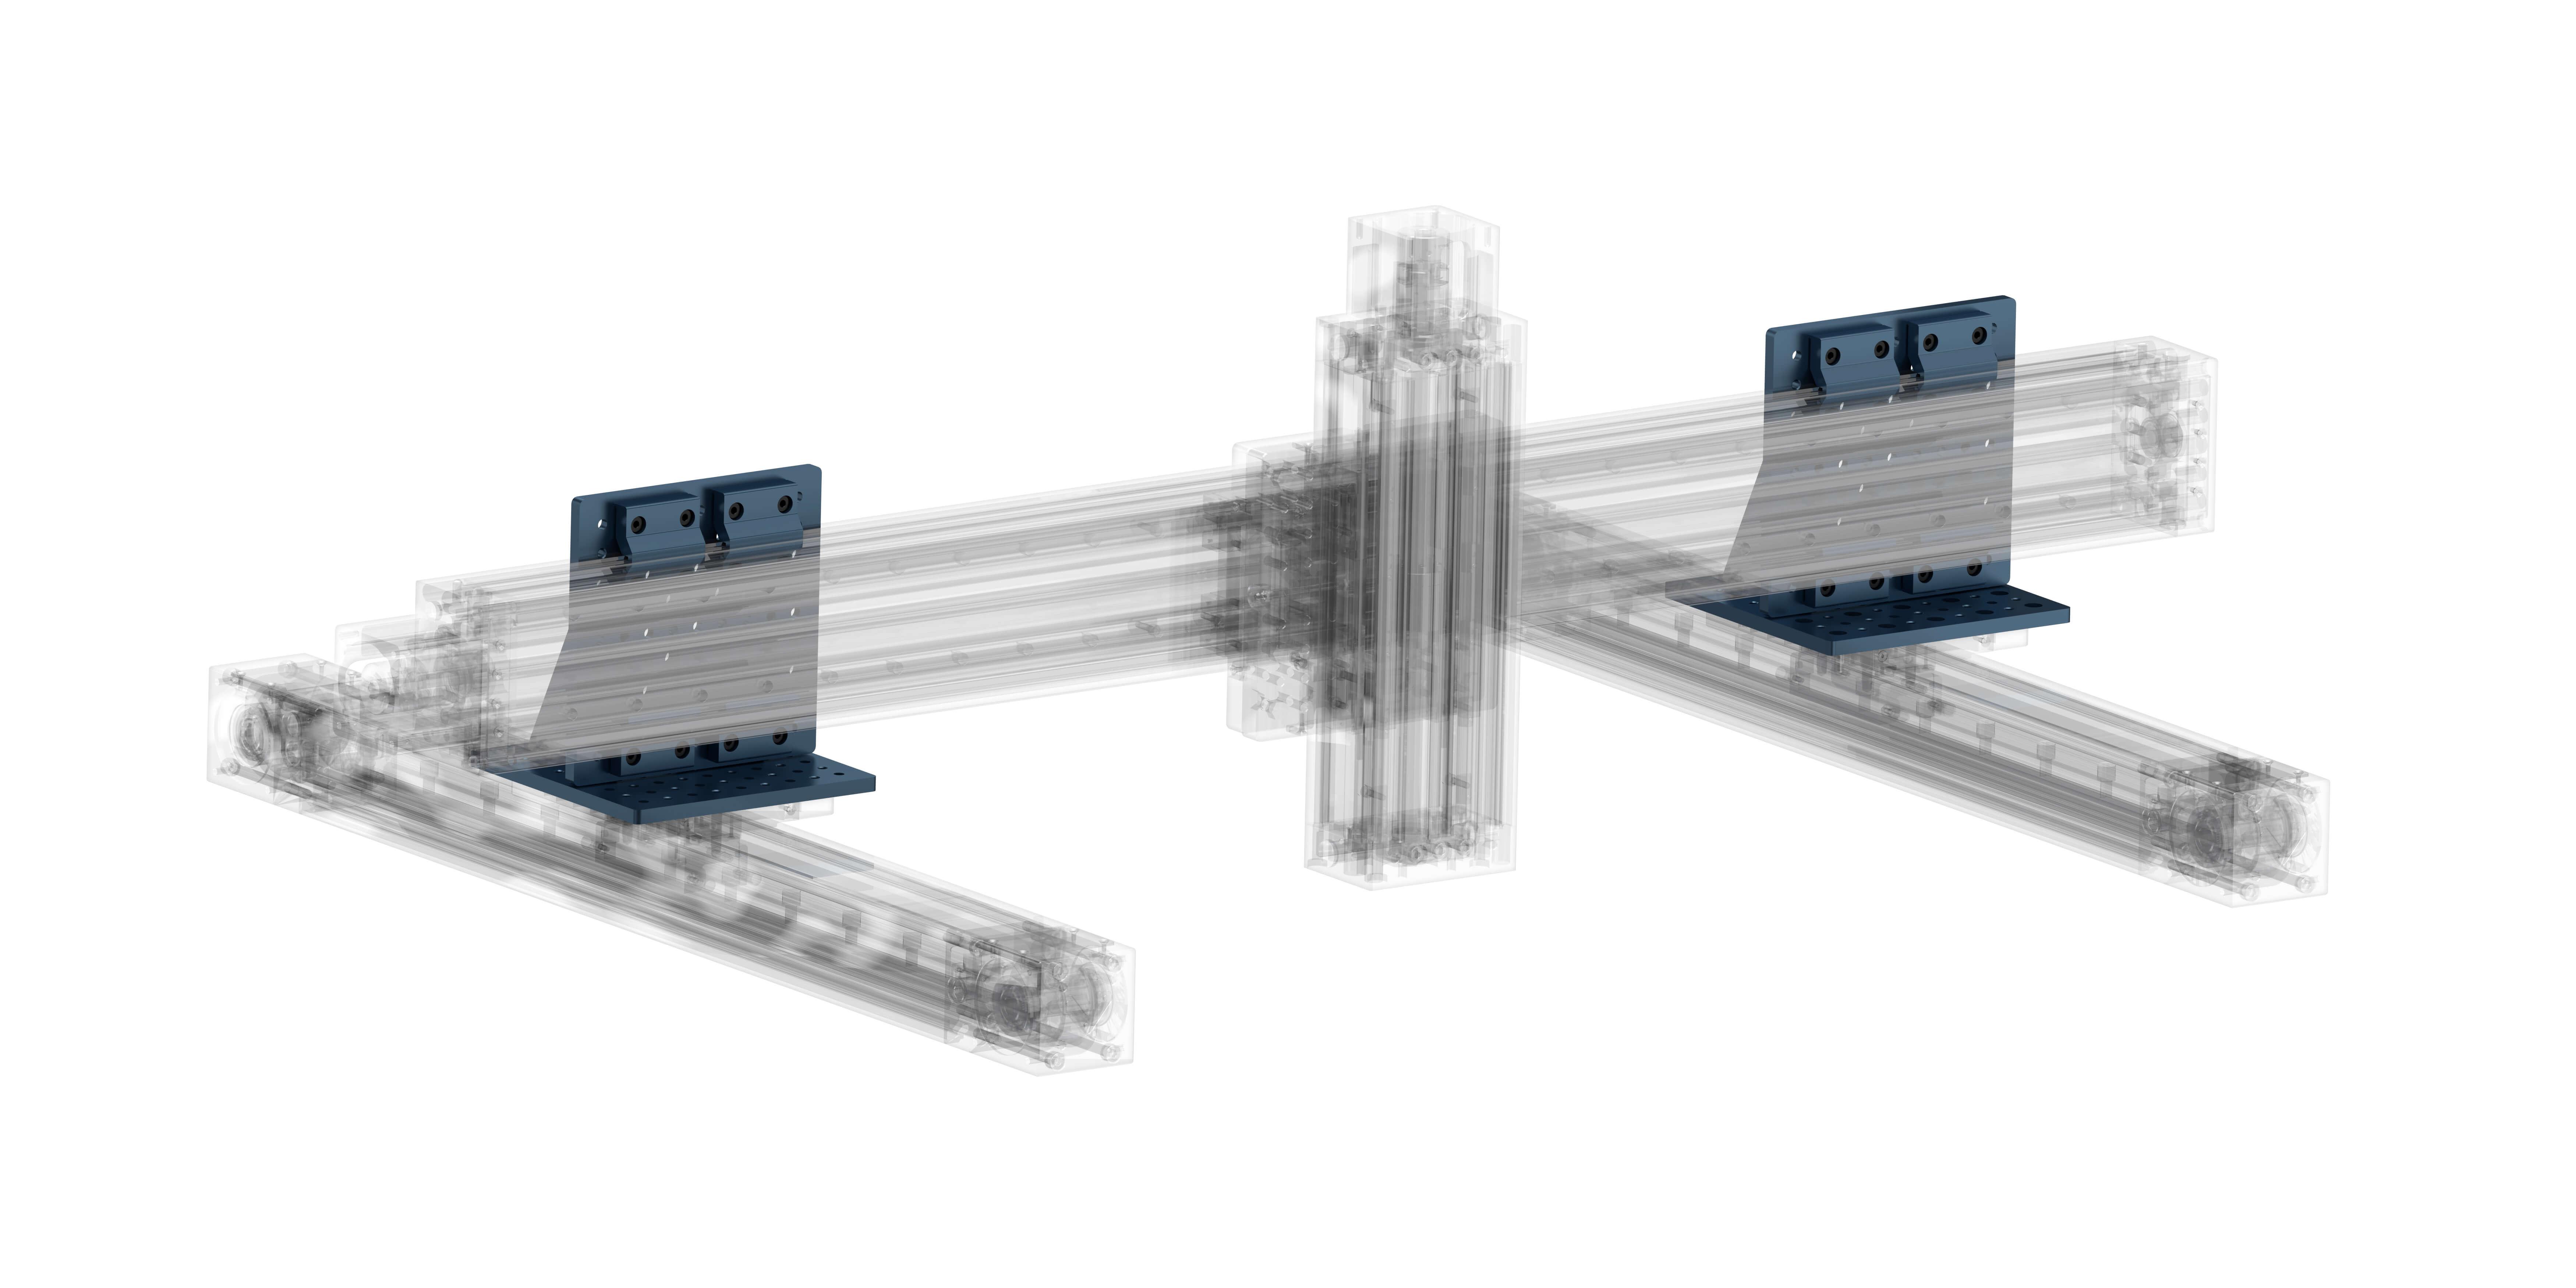 Example 1: Three-axis machine mount configuration.